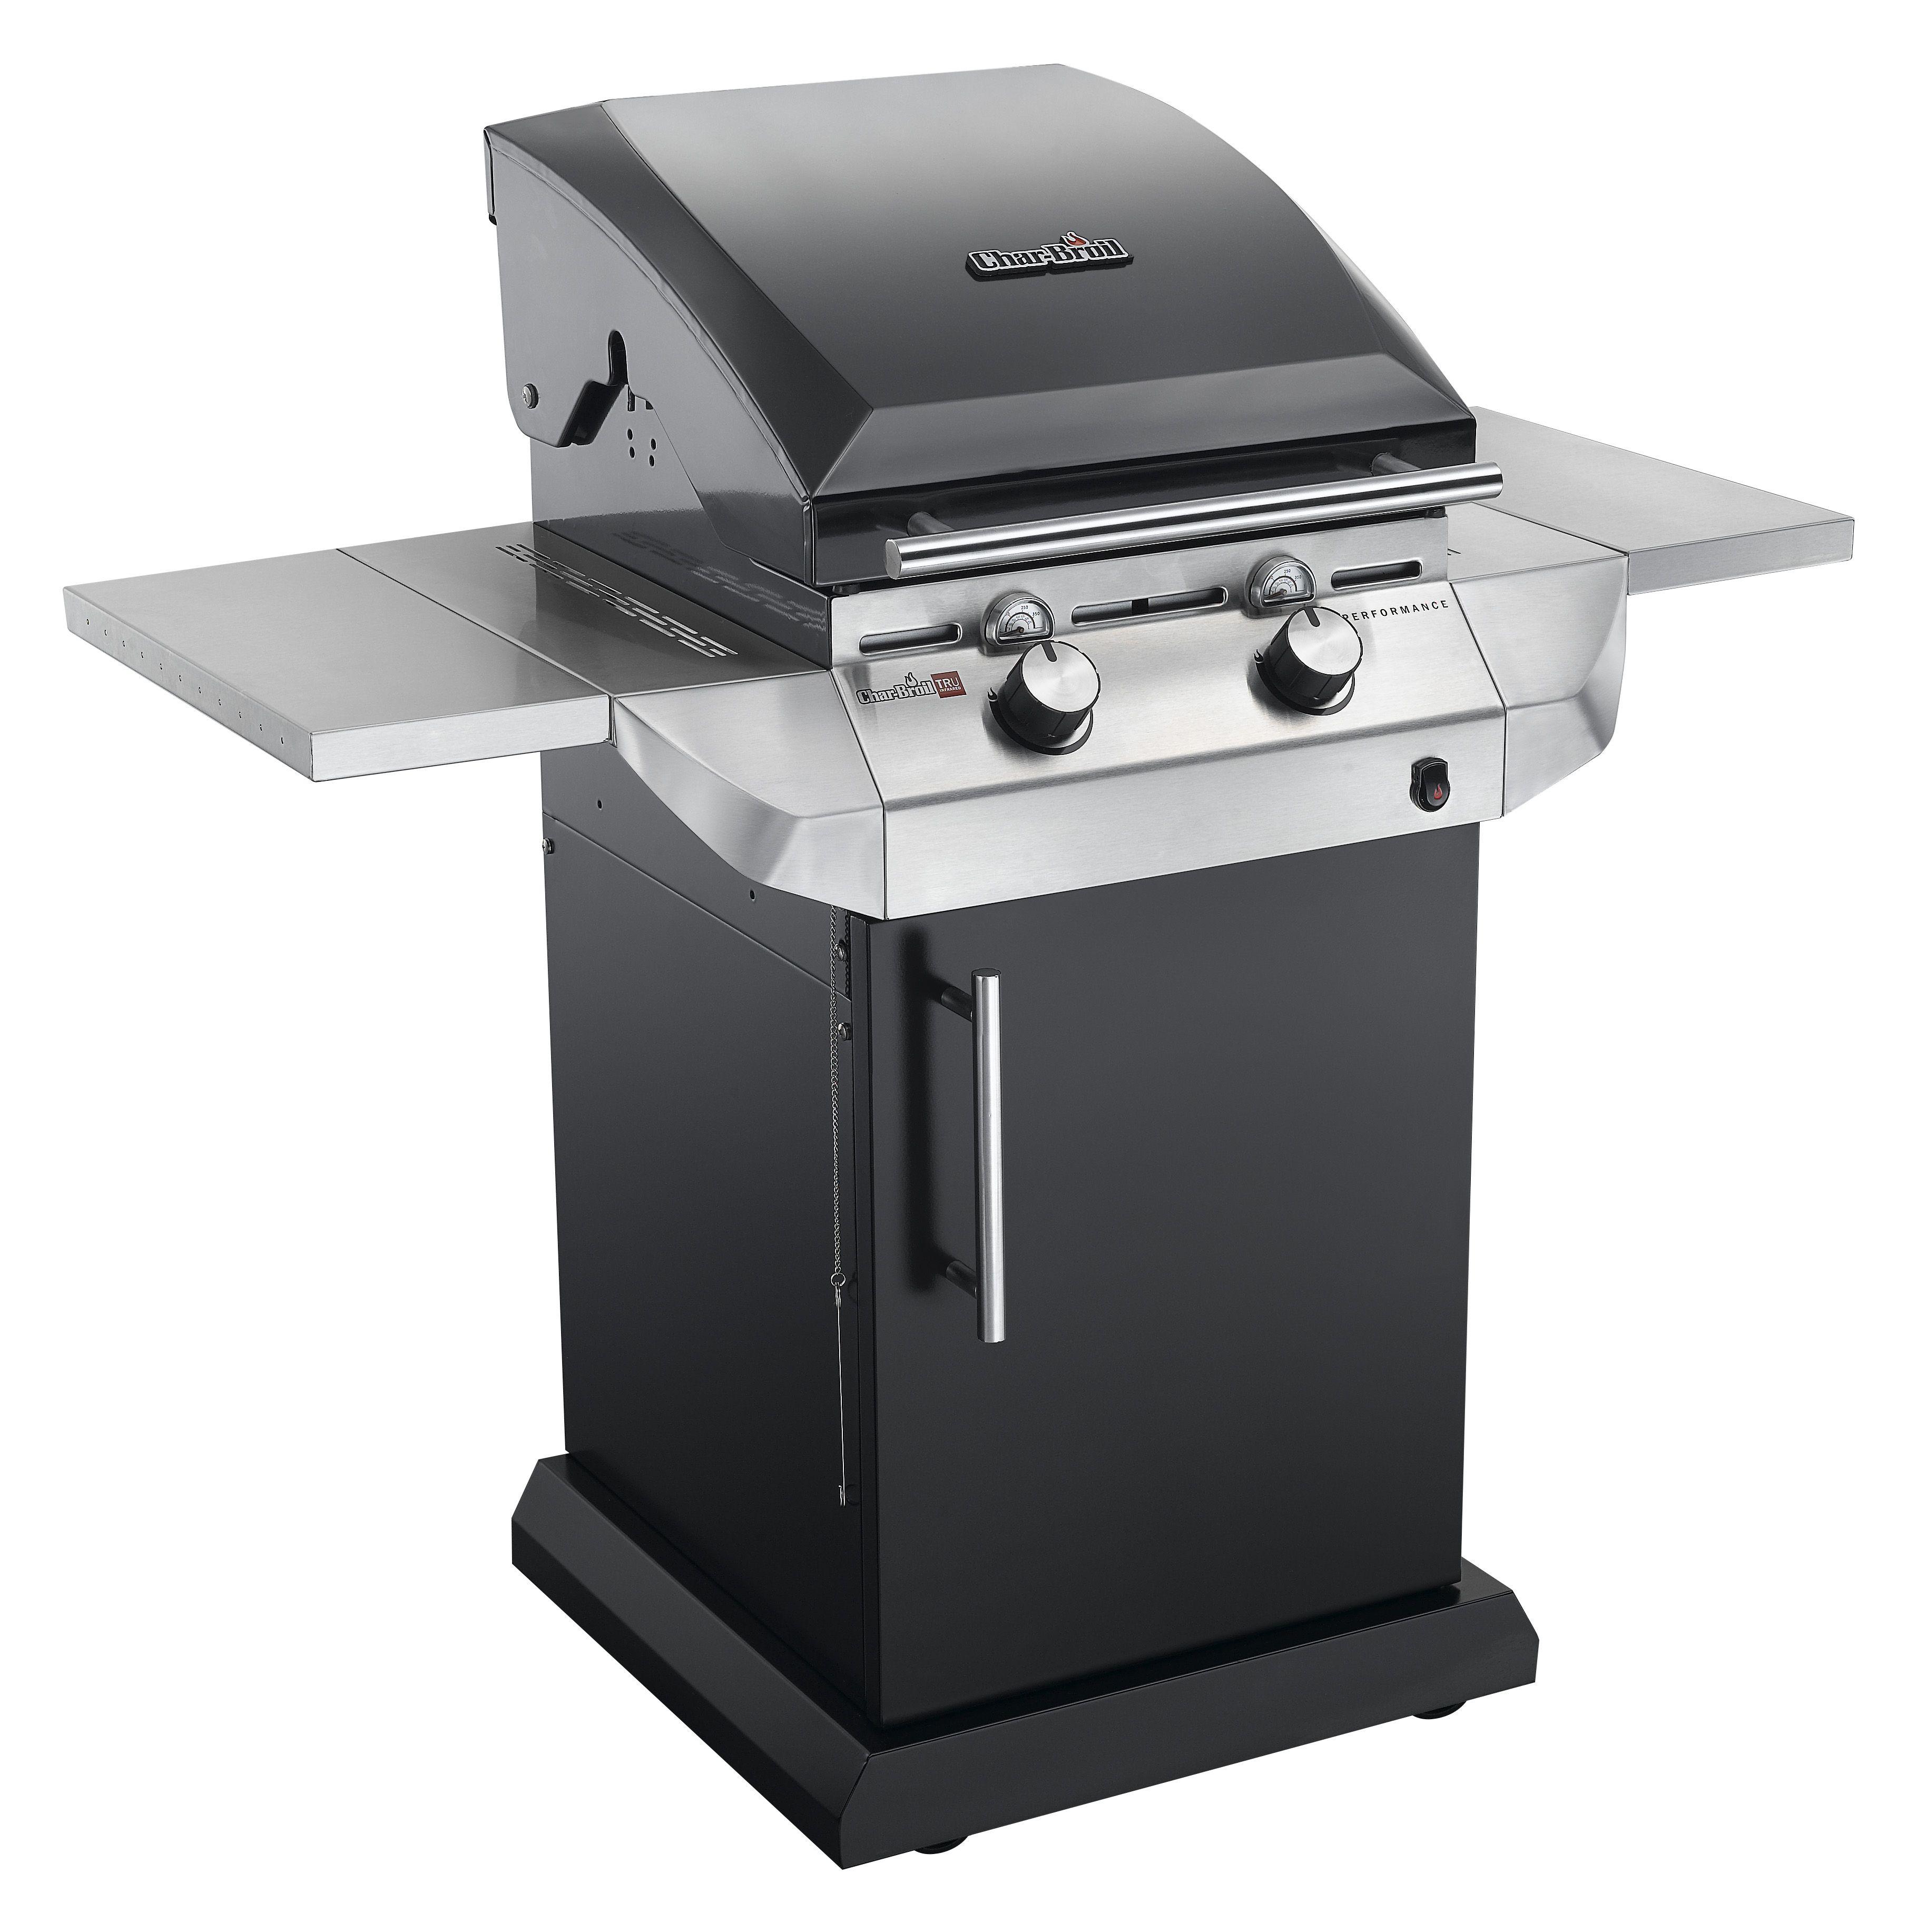 weber q1000 1 burner gas barbecue departments diy at b q. Black Bedroom Furniture Sets. Home Design Ideas